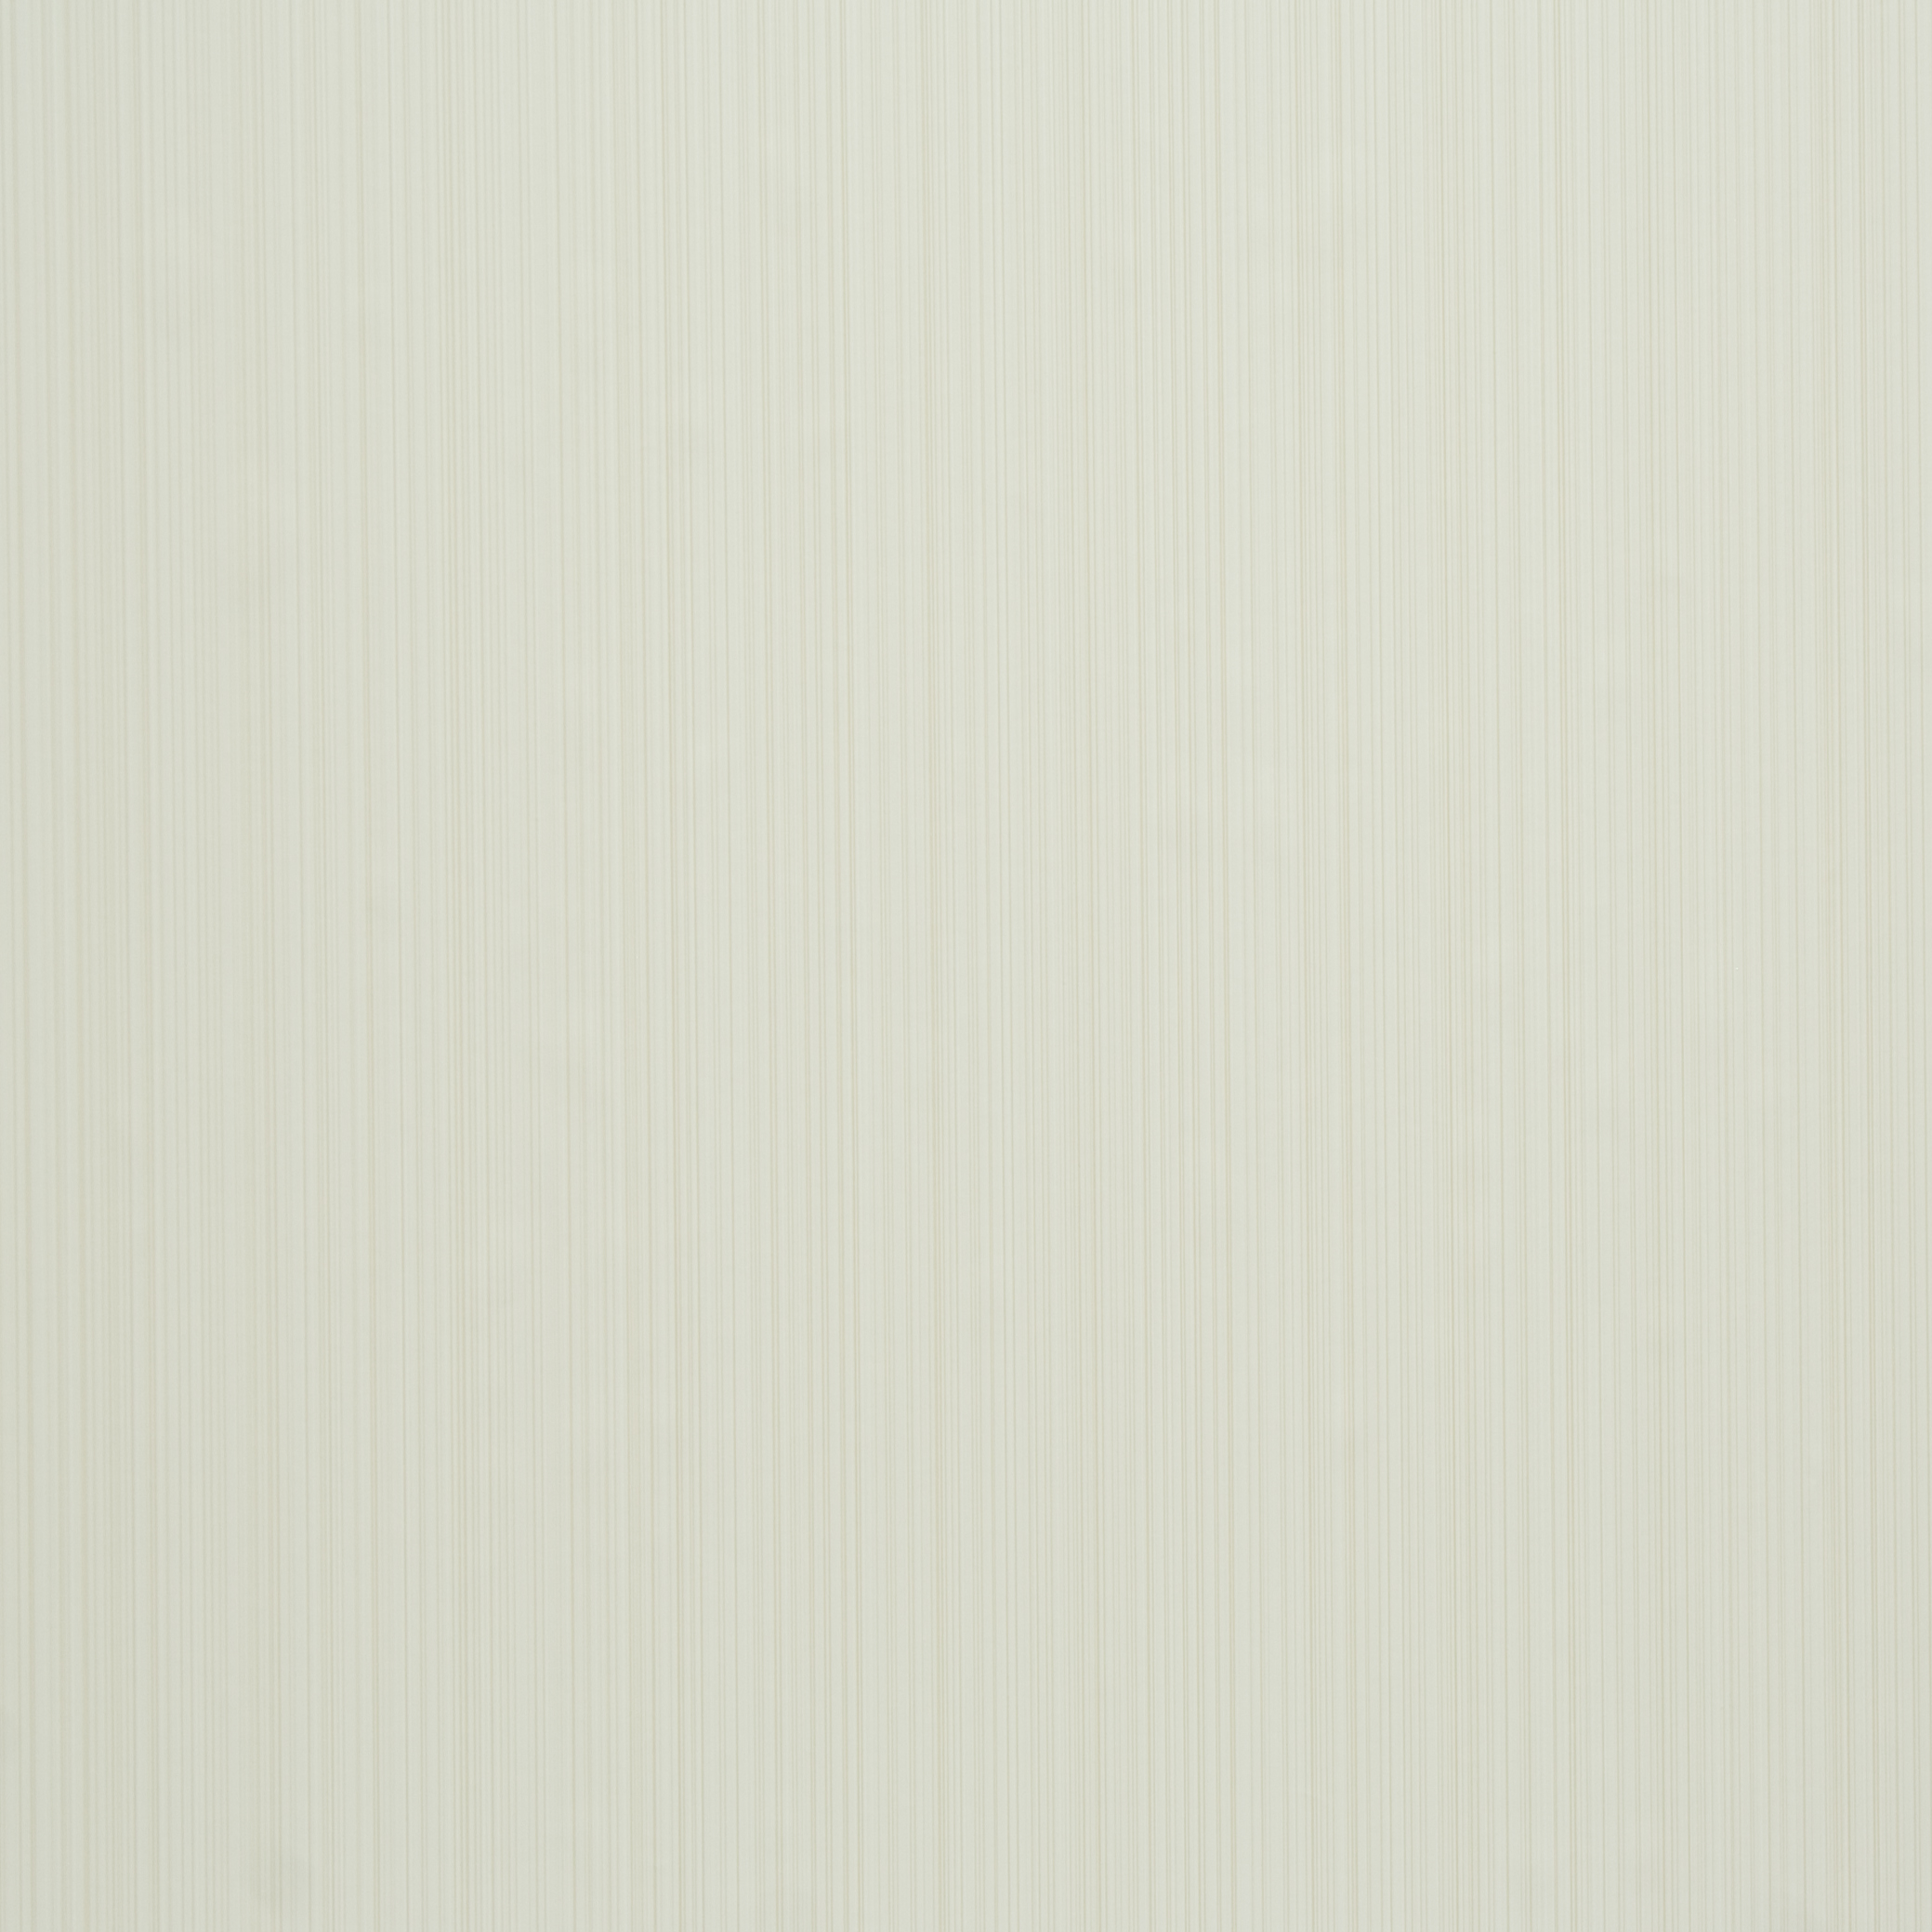 Обои  BN International,  коллекция Colour Line, артикул49114